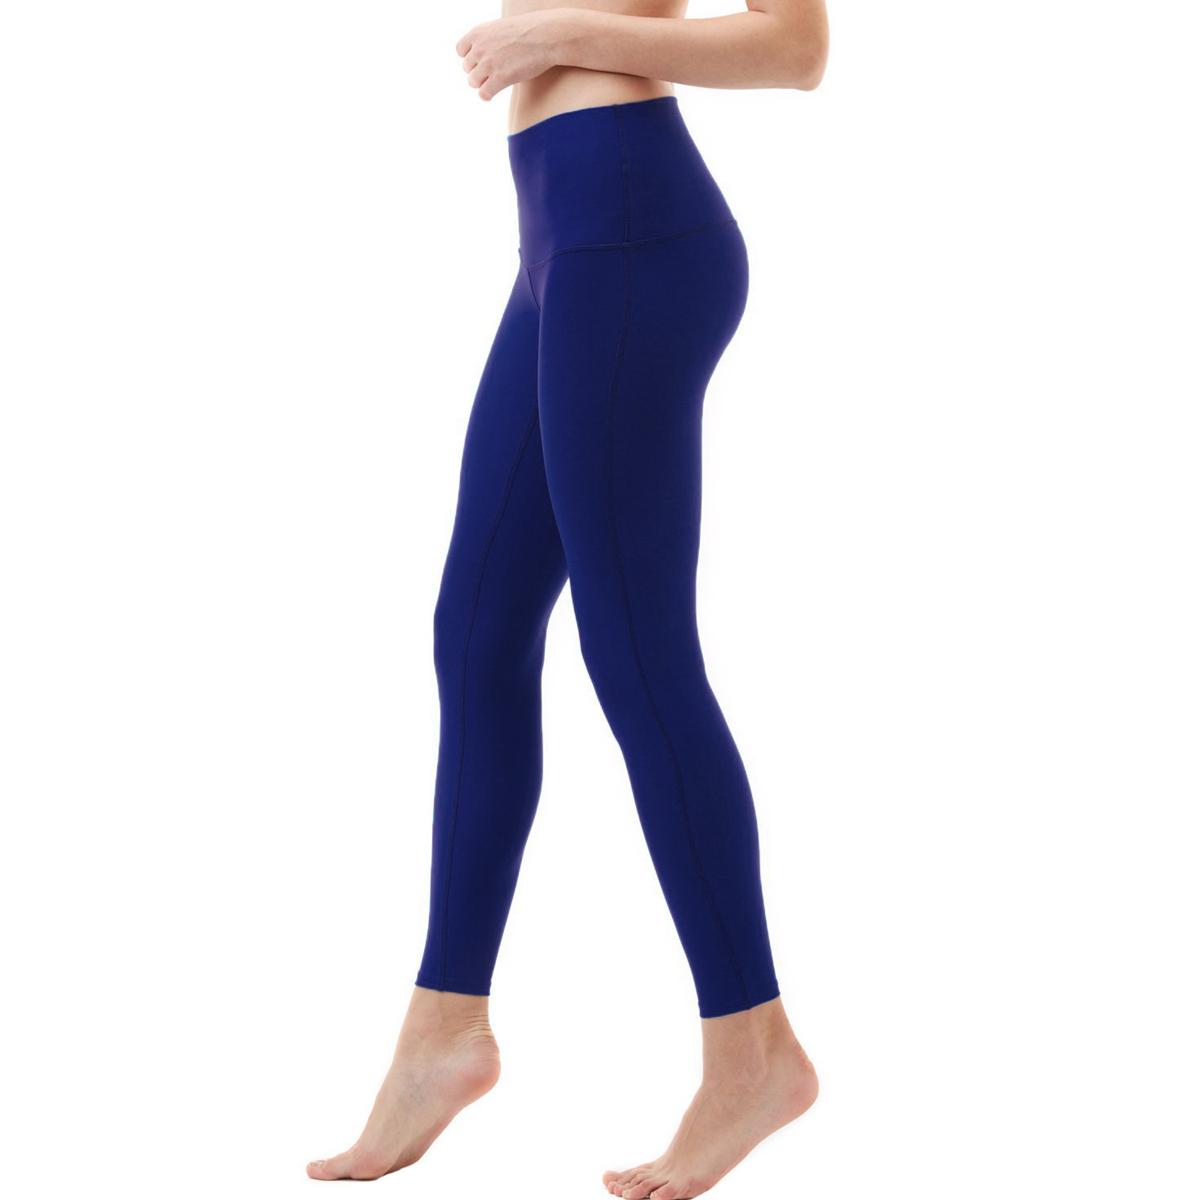 thumbnail 29 - TSLA Tesla FYP42 Women's High-Waisted Ultra-Stretch Tummy Control Yoga Pants